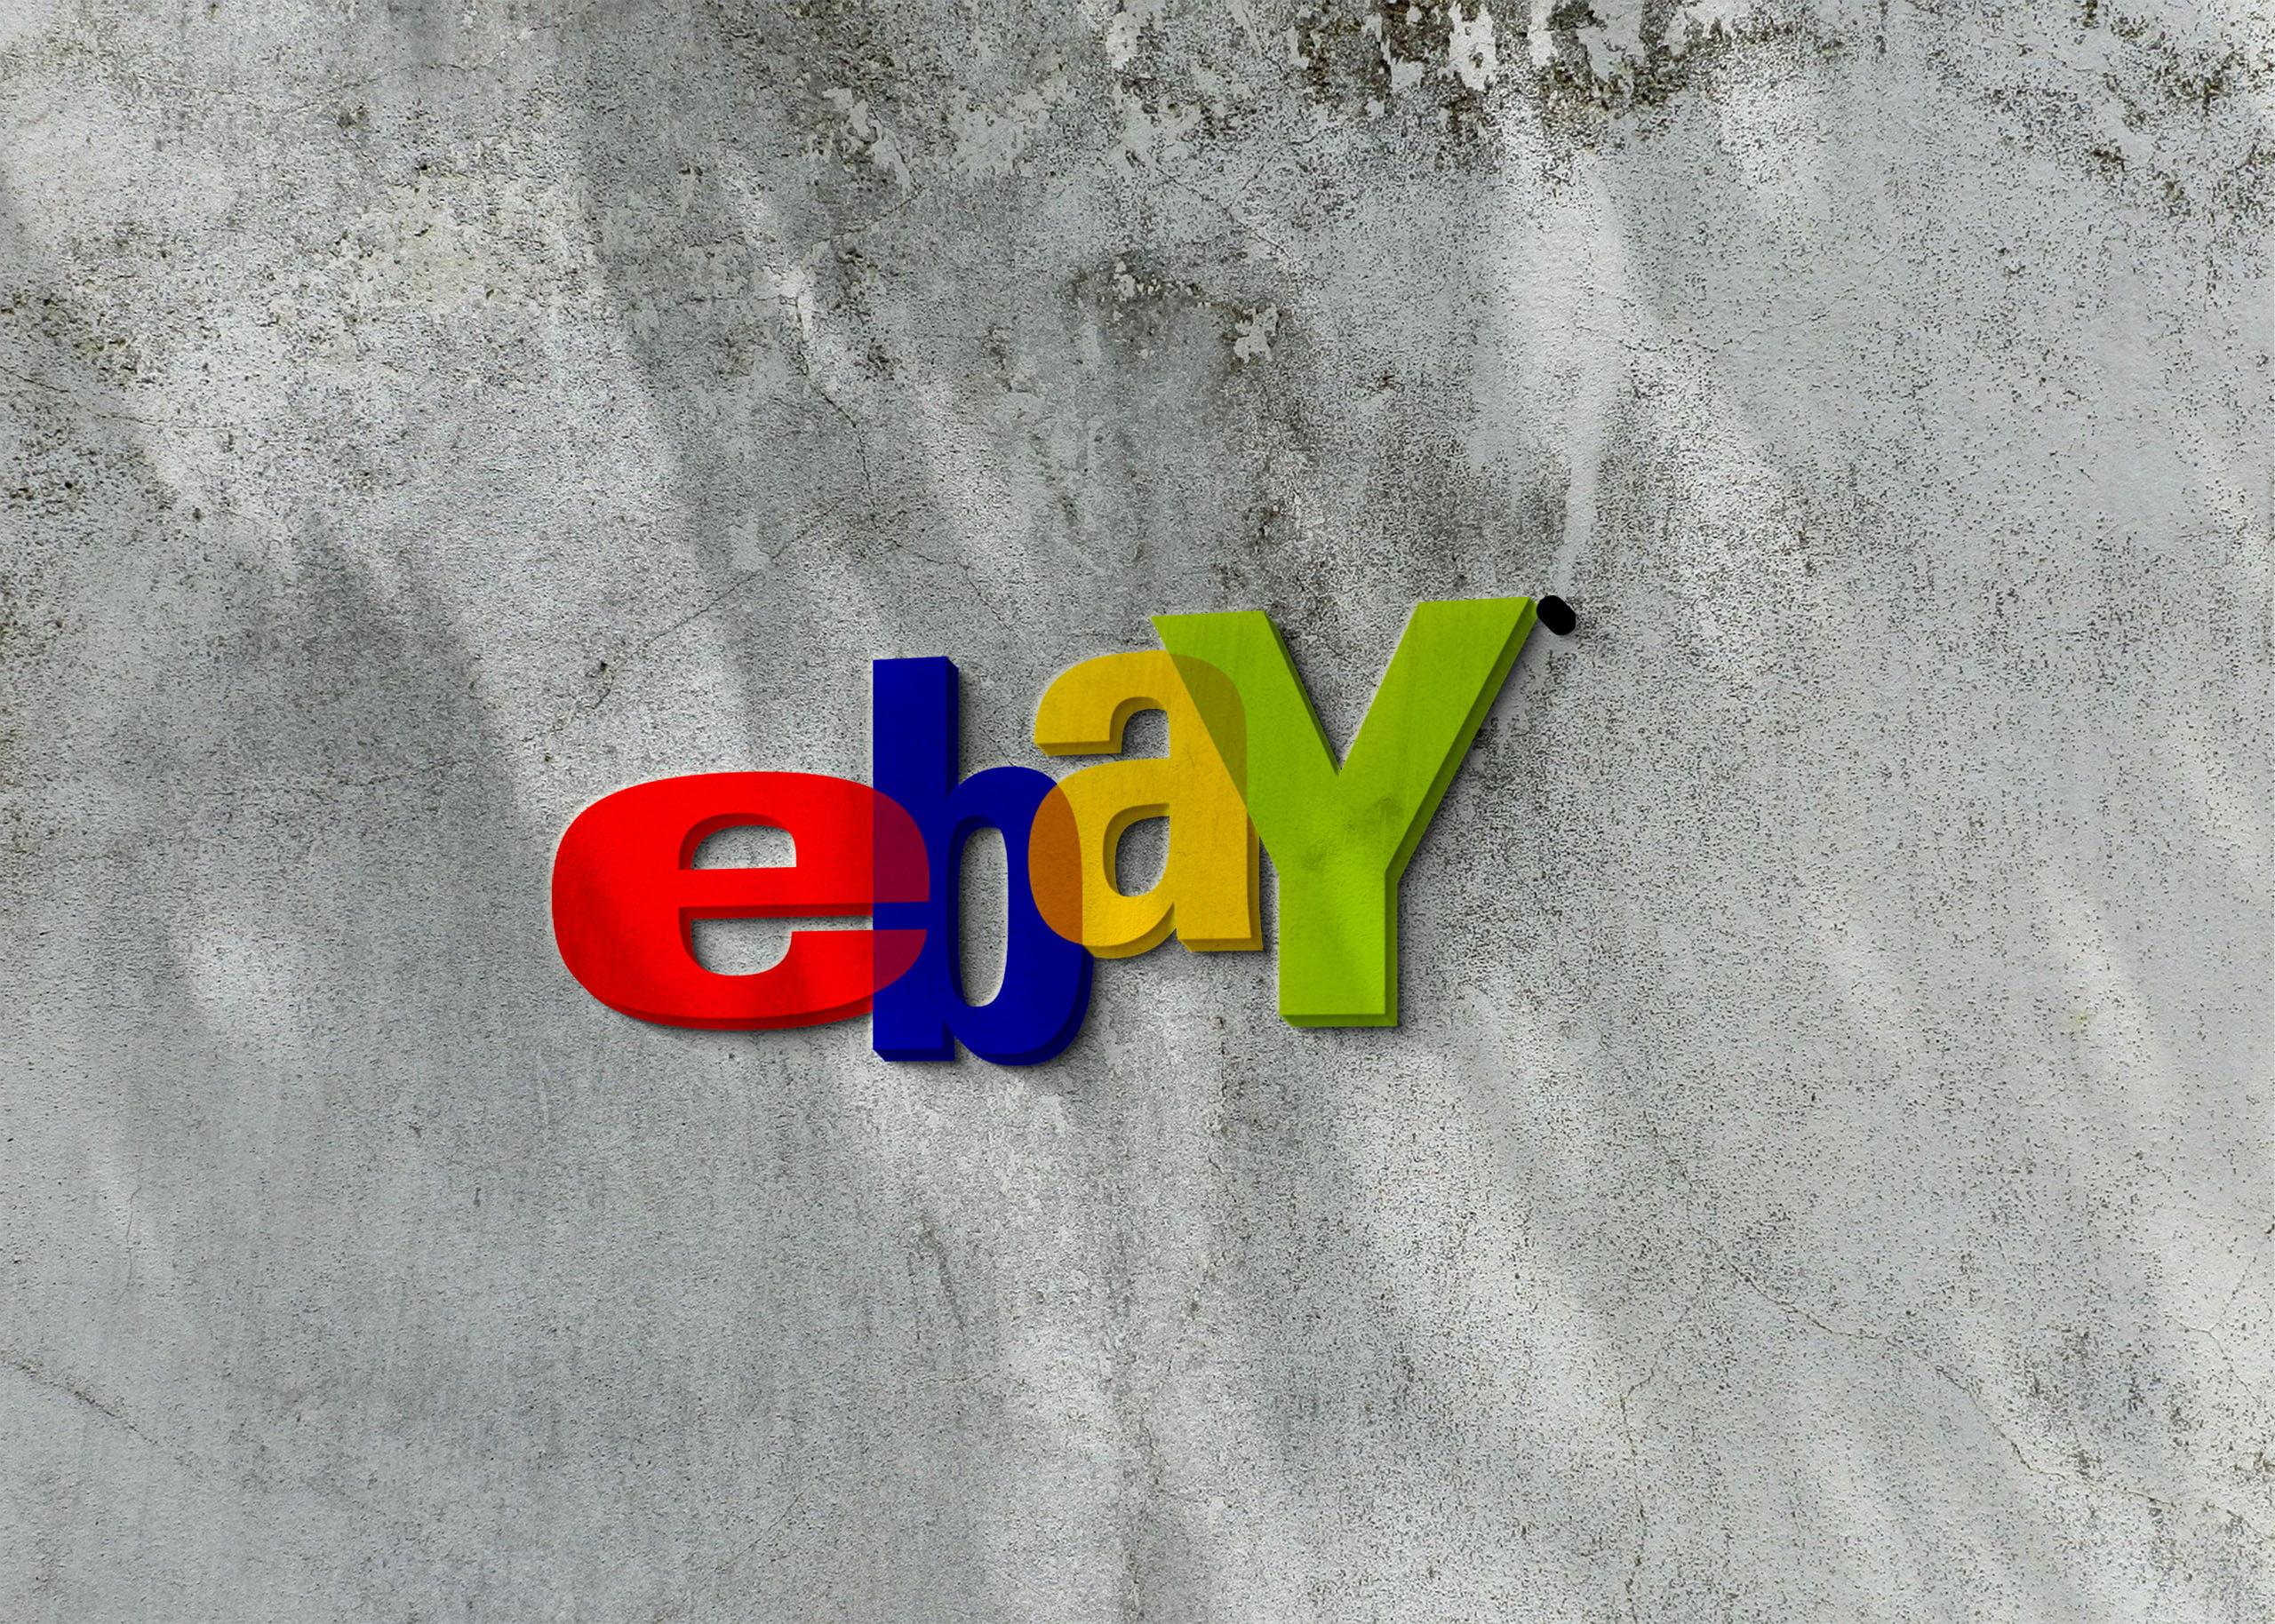 Ebay logo on 3d wall